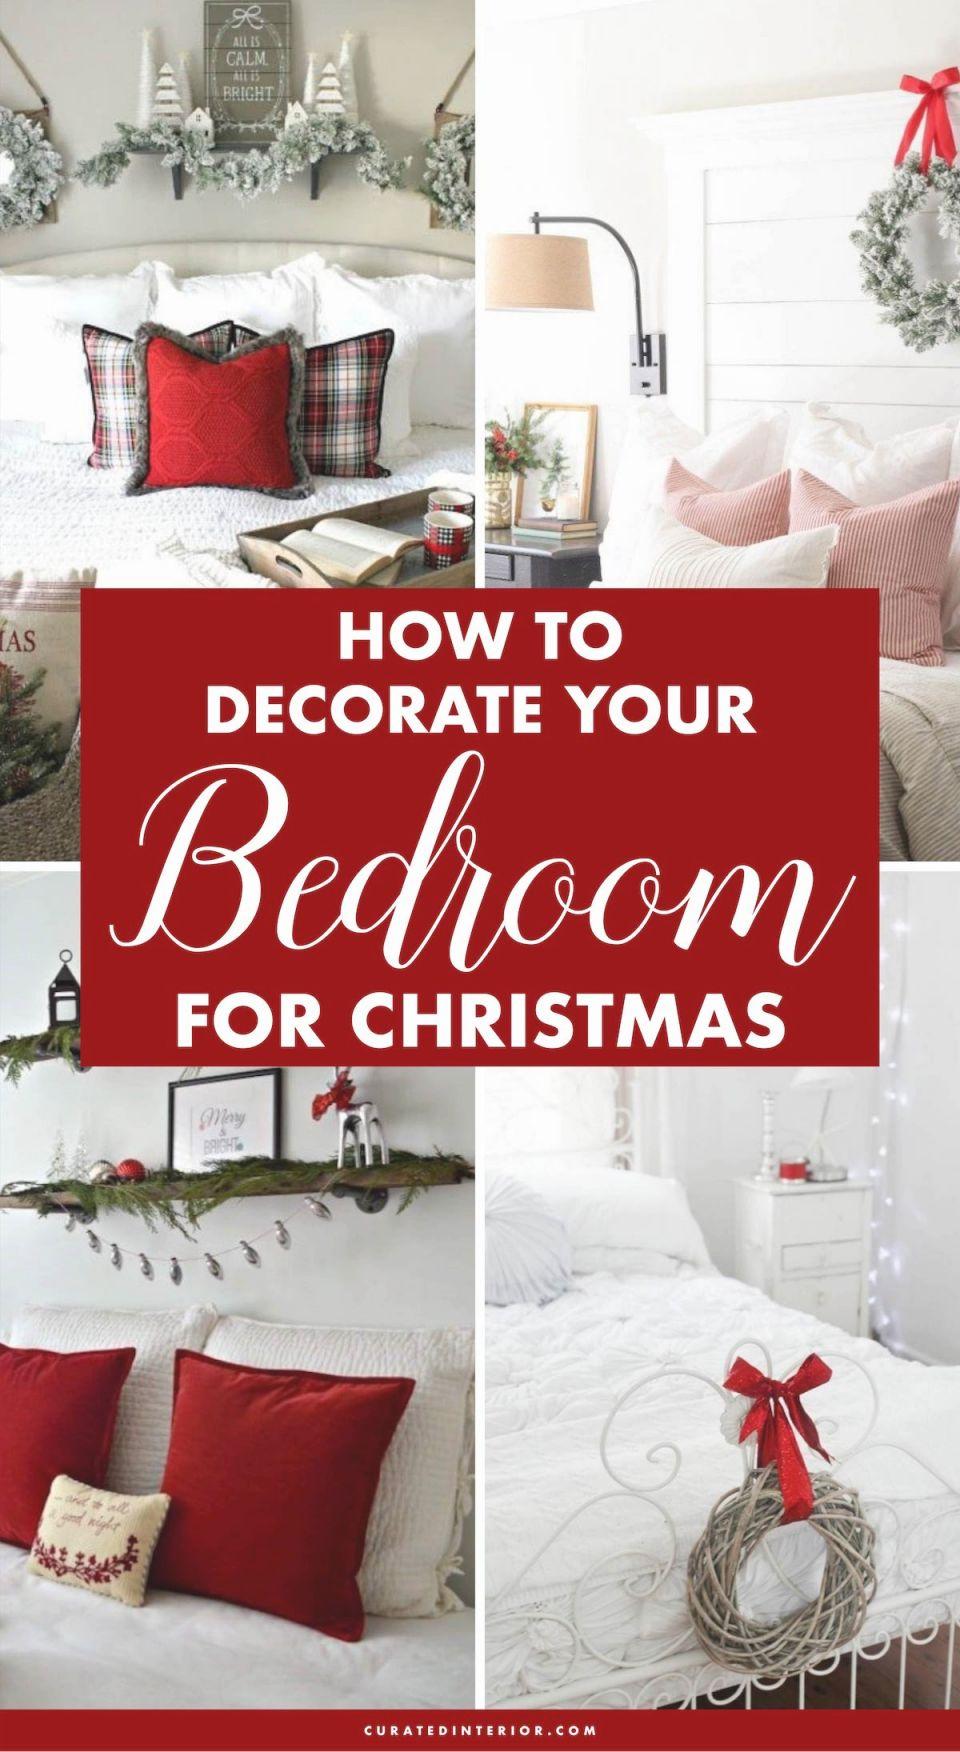 25 Christmas Bedroom Decor Ideas For A Cozy Holiday Bedroom! in Decoration For Bedrooms Ideas